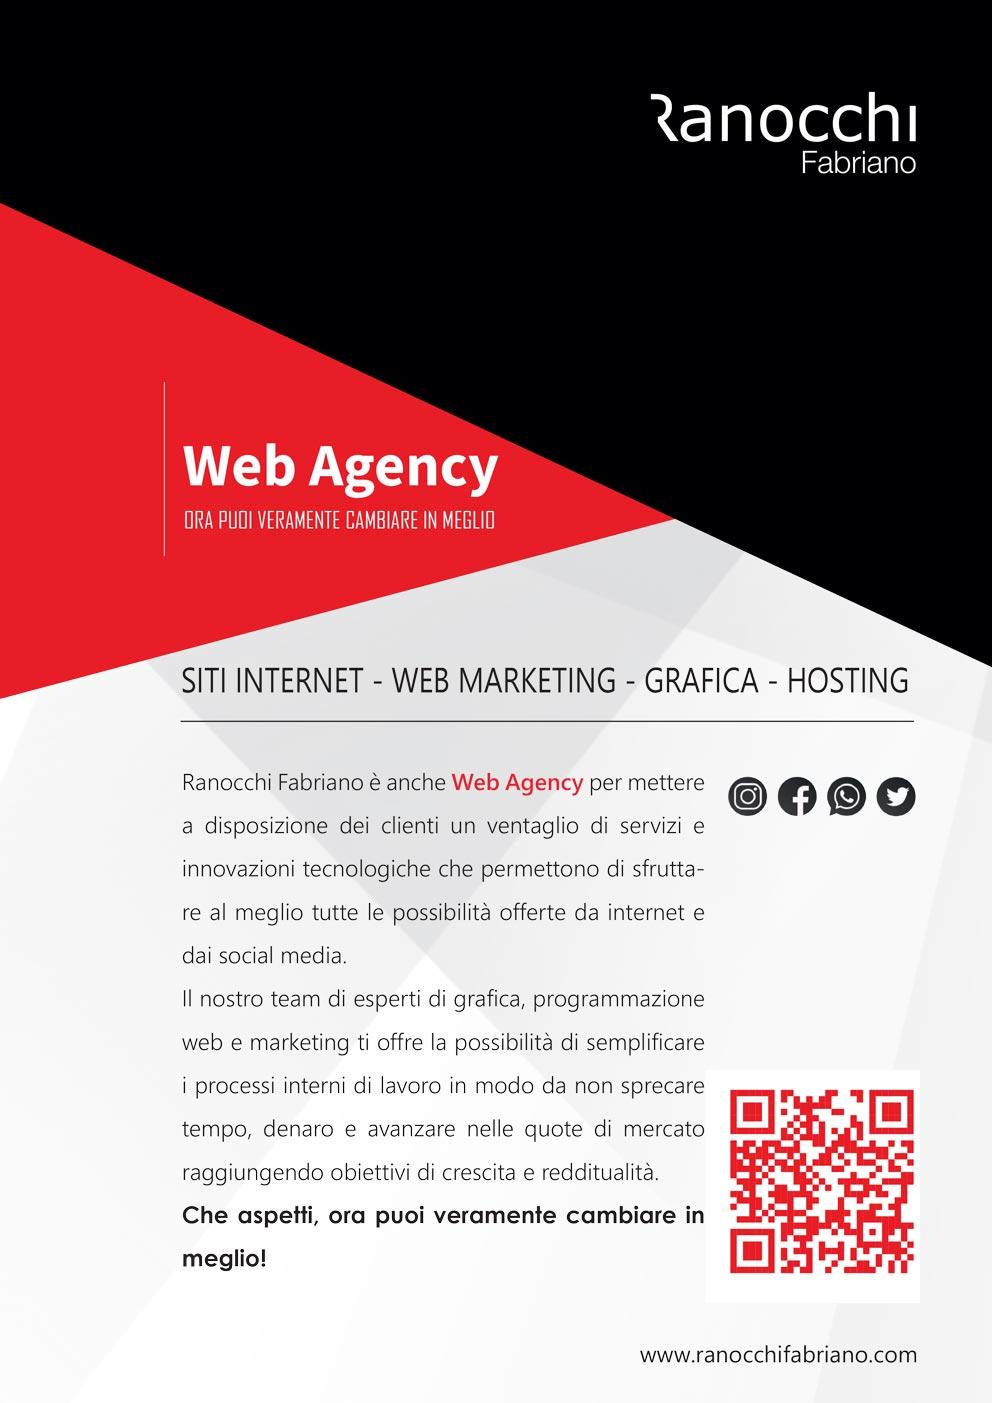 Ranocchi Fabriano Web Agency